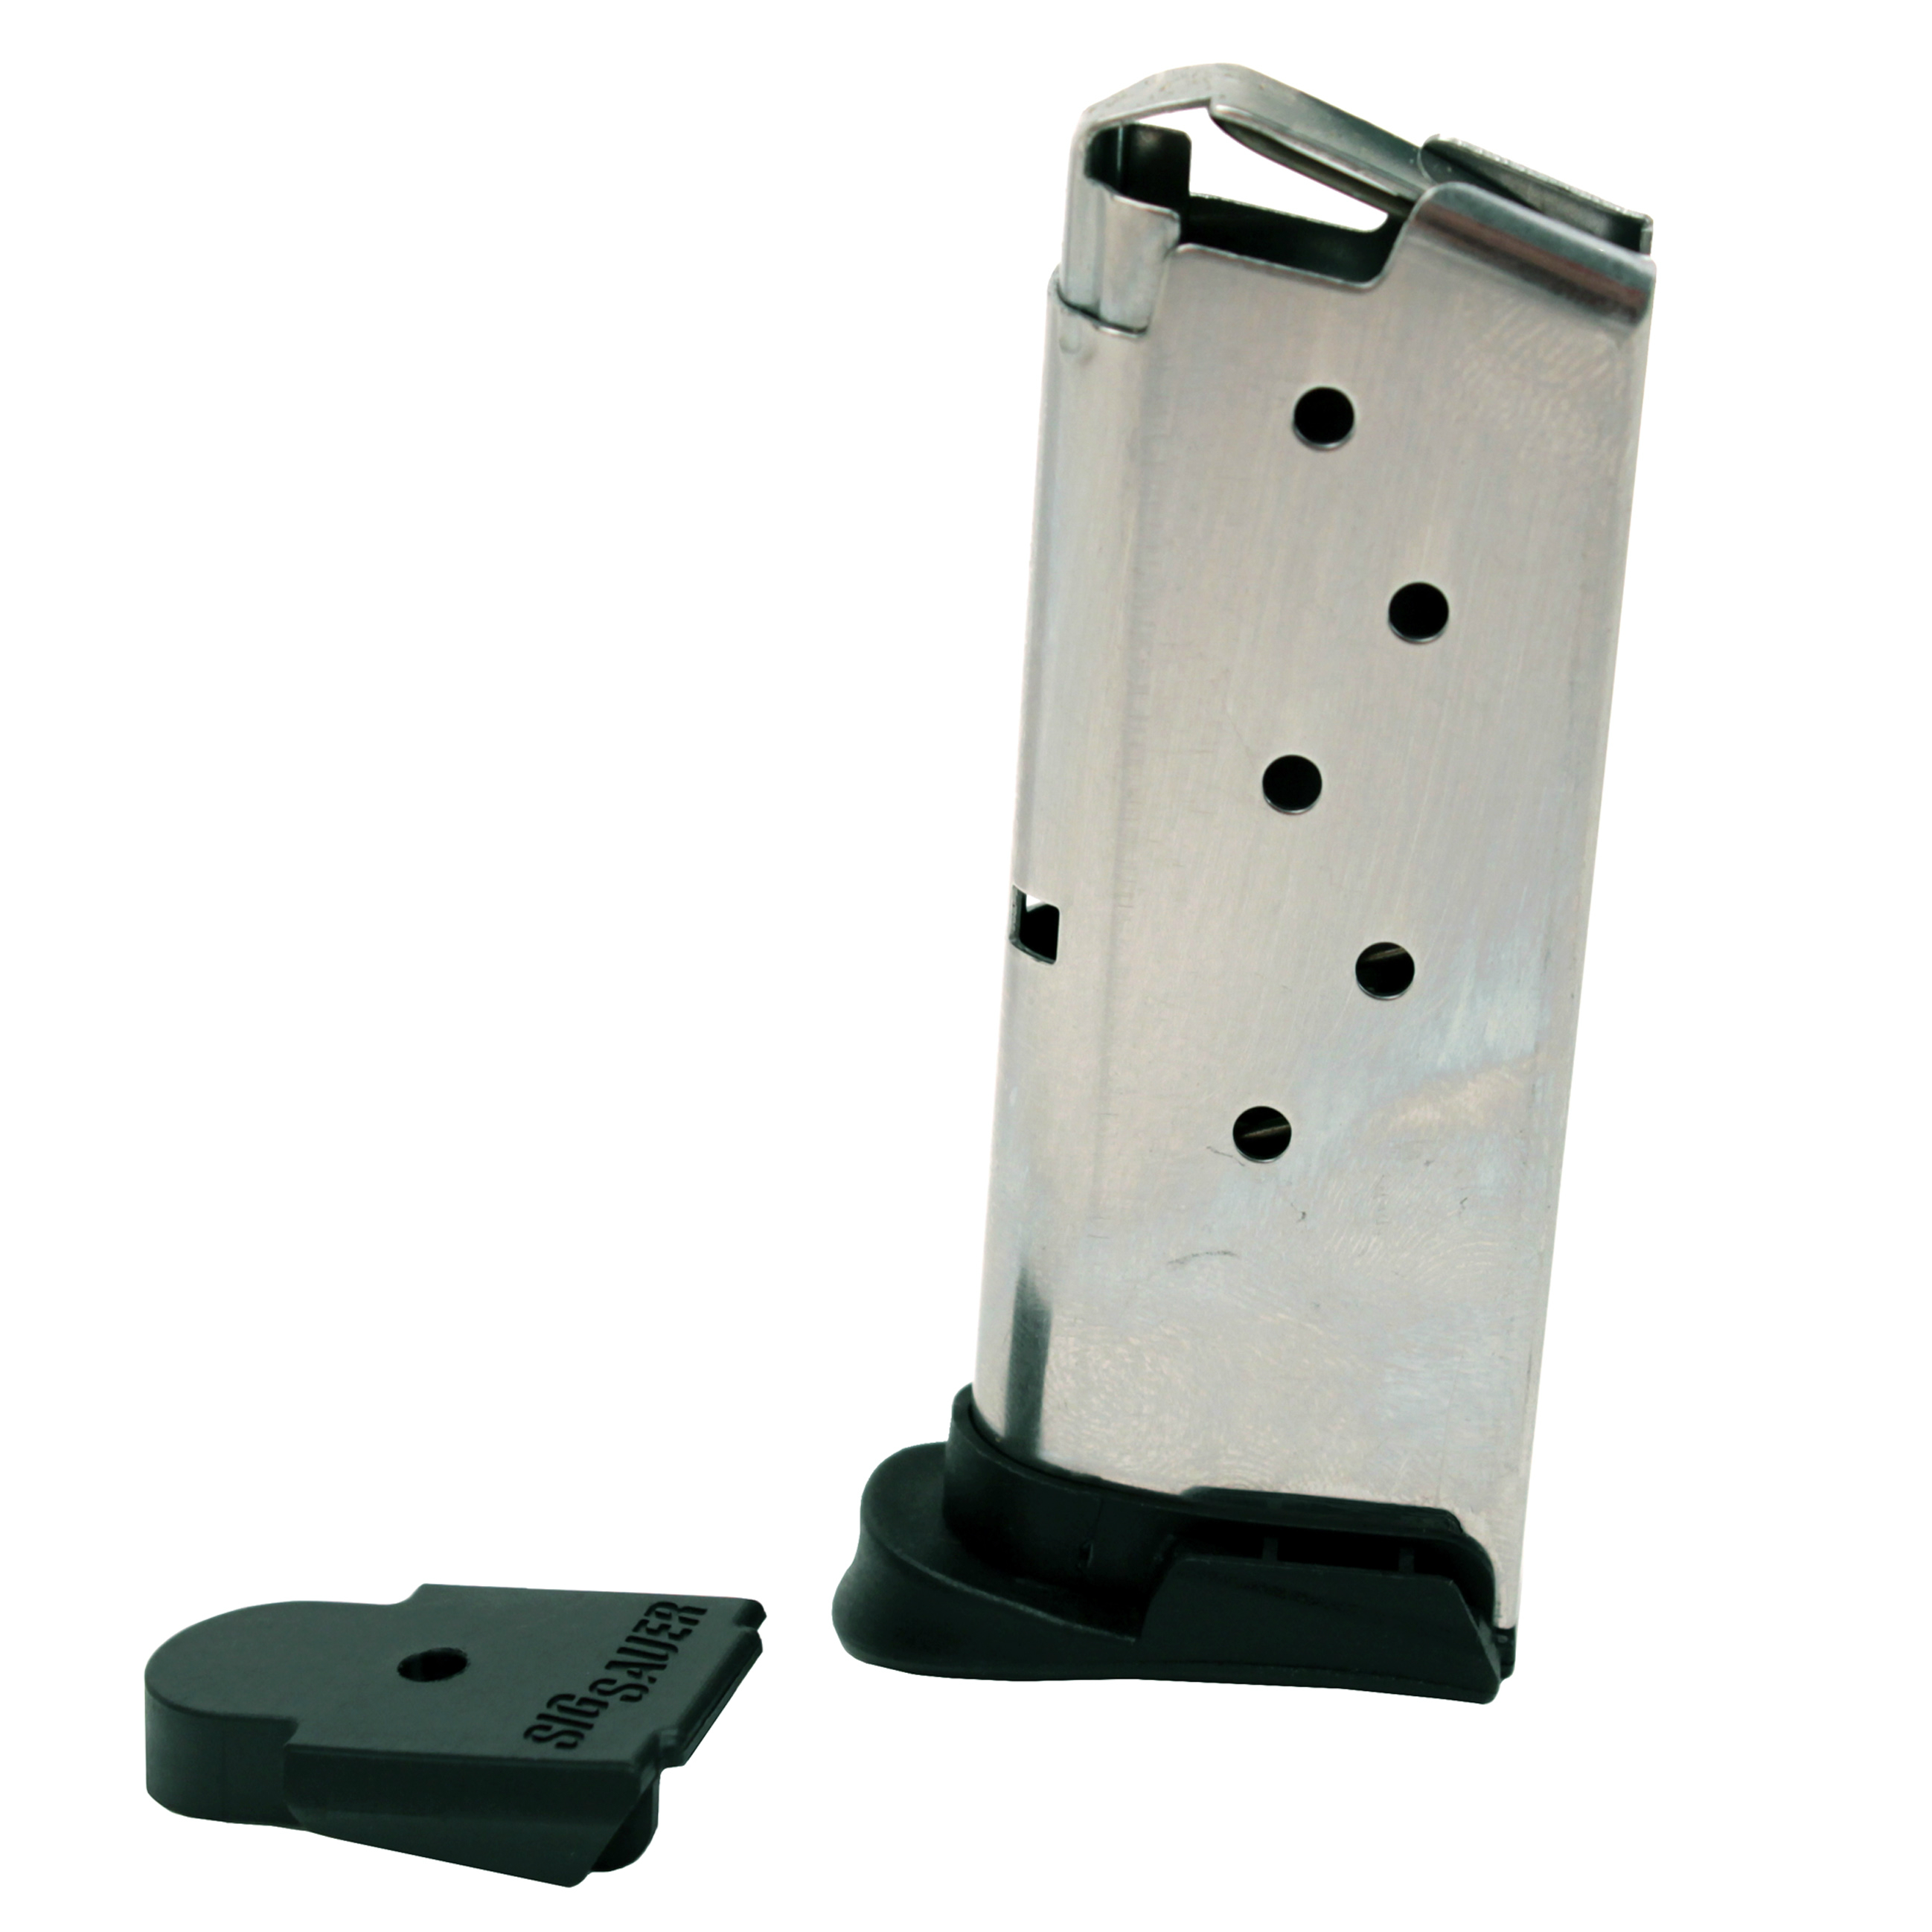 Sig Sauer P290 9mm Luger 6 Round OEM Factory Magazine w// Extender MAG-290-9-6